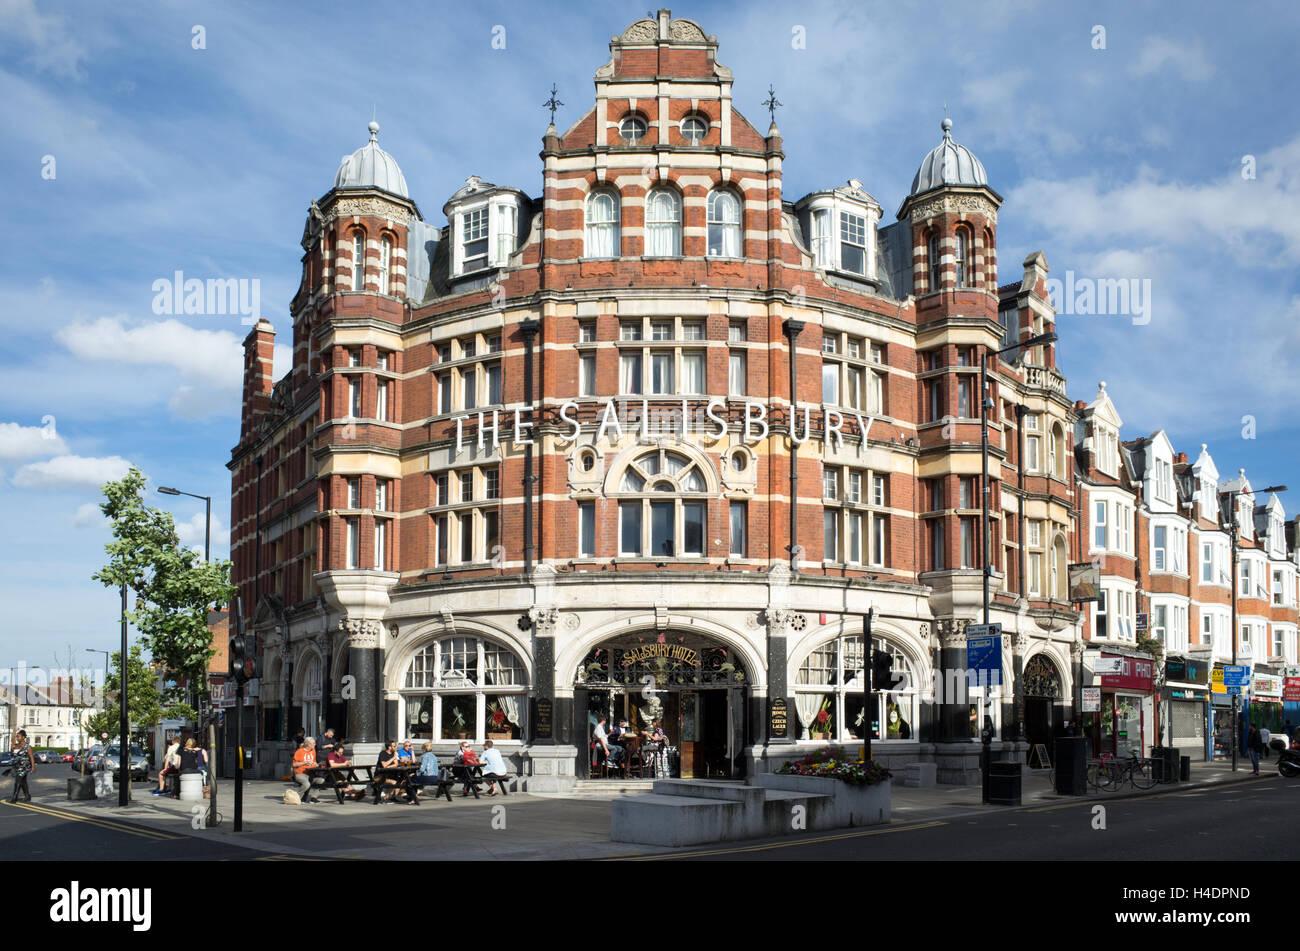 The Salisbury pub on Green Lanes in Haringey, London, England, UK - Stock Image